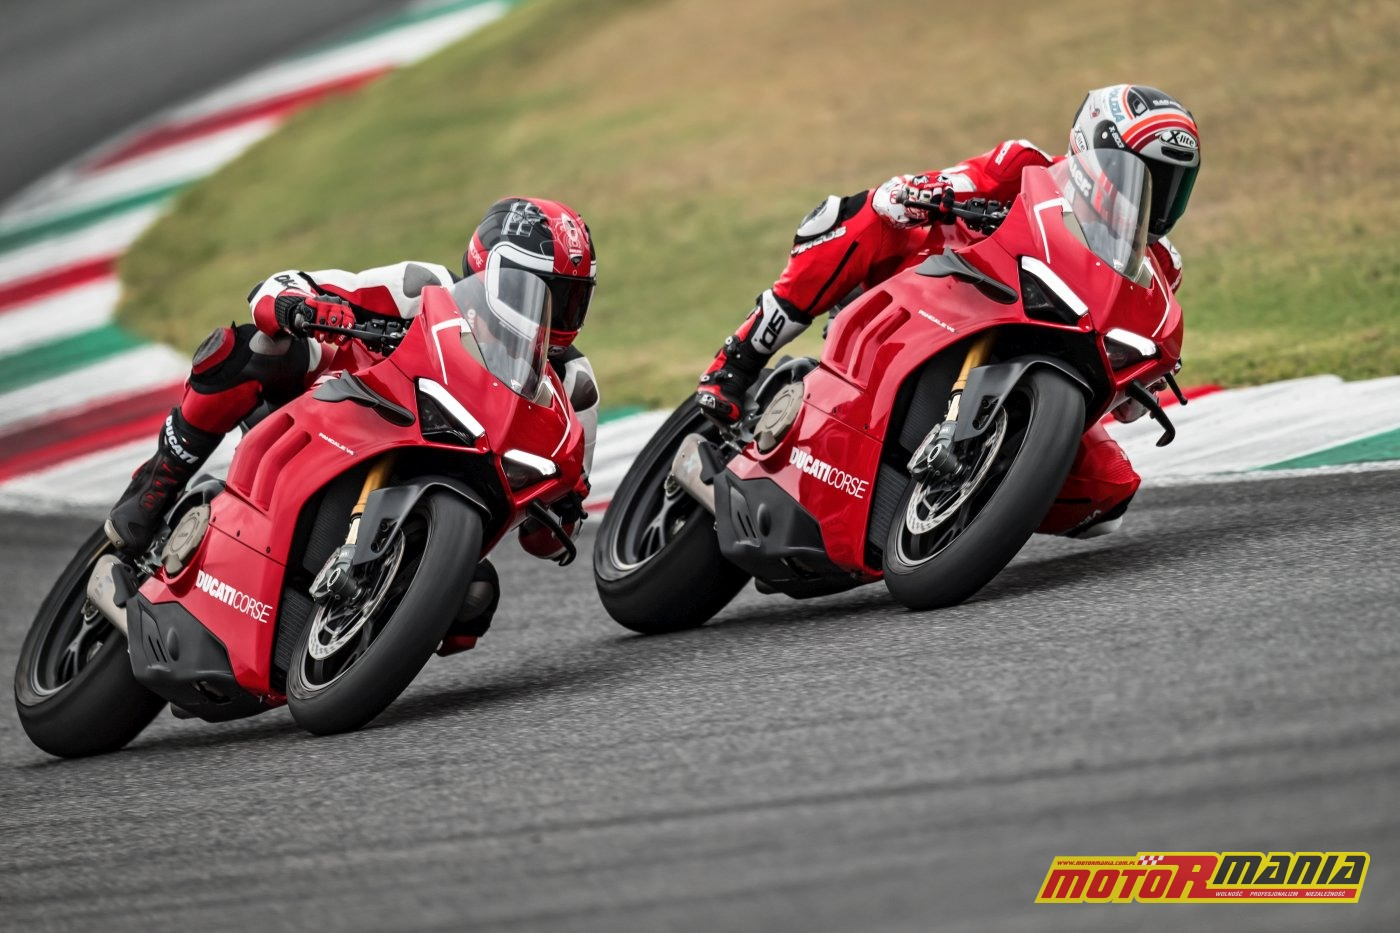 Ducati Panigale V4 R 2019 (1)